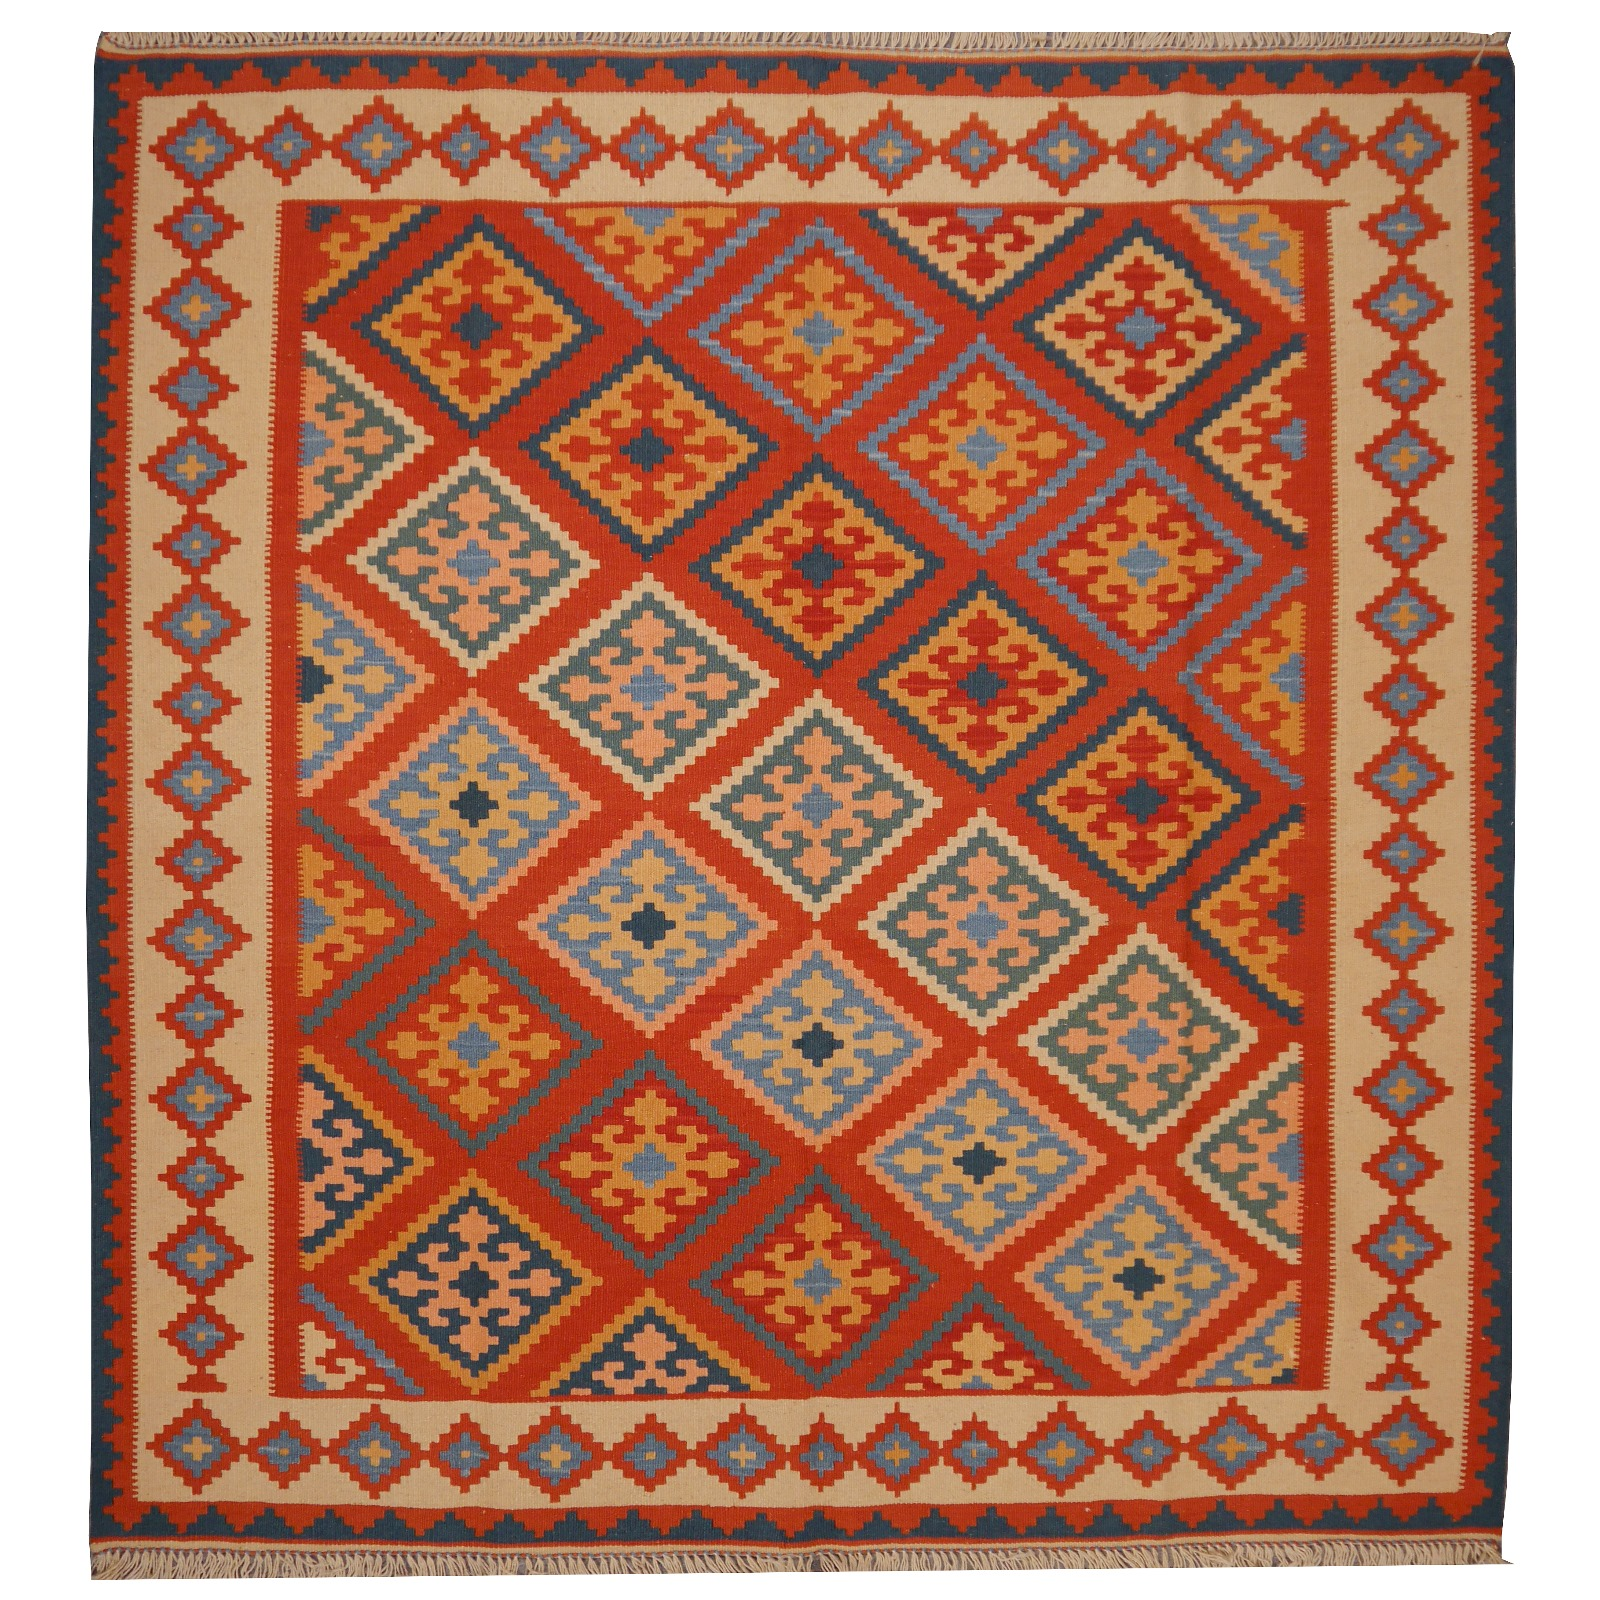 12517 kilim rug iran persia 4 9 x 4 6 ft 149 x 141 cm persian rugs oriental rugs silk. Black Bedroom Furniture Sets. Home Design Ideas